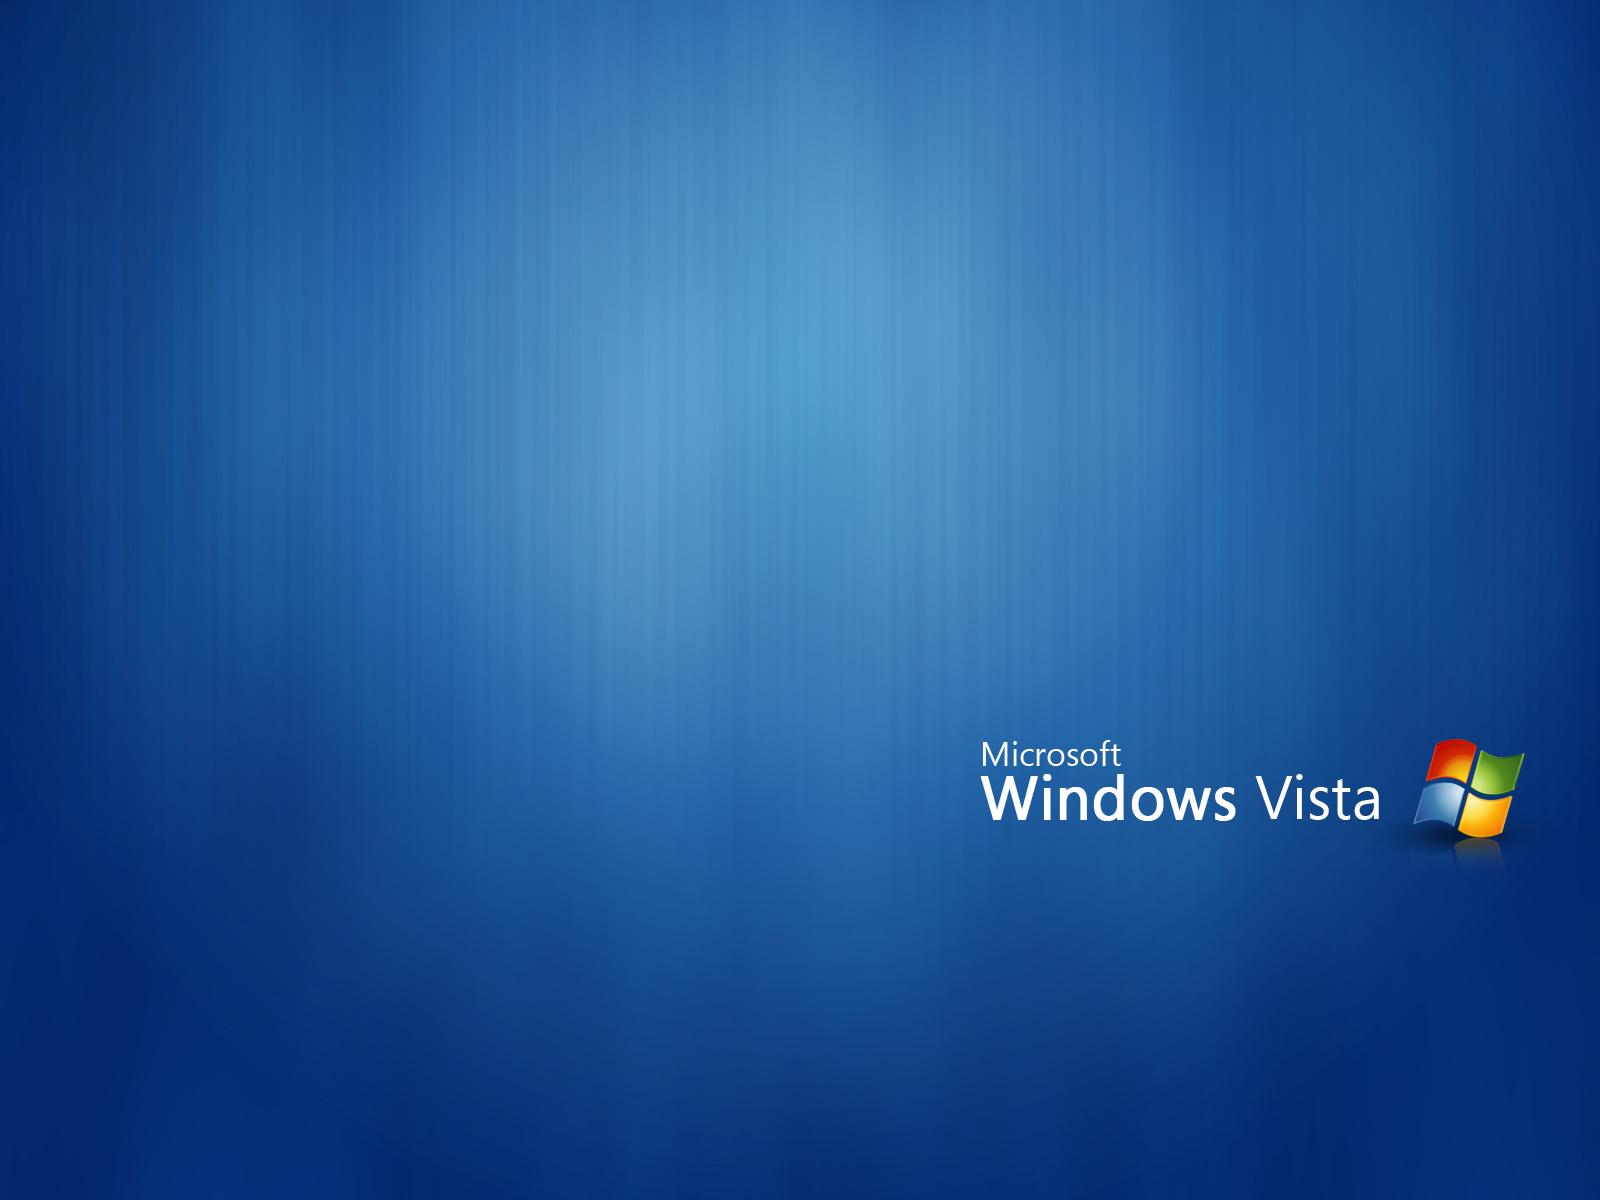 download wallpapers: wallpaper windows vista